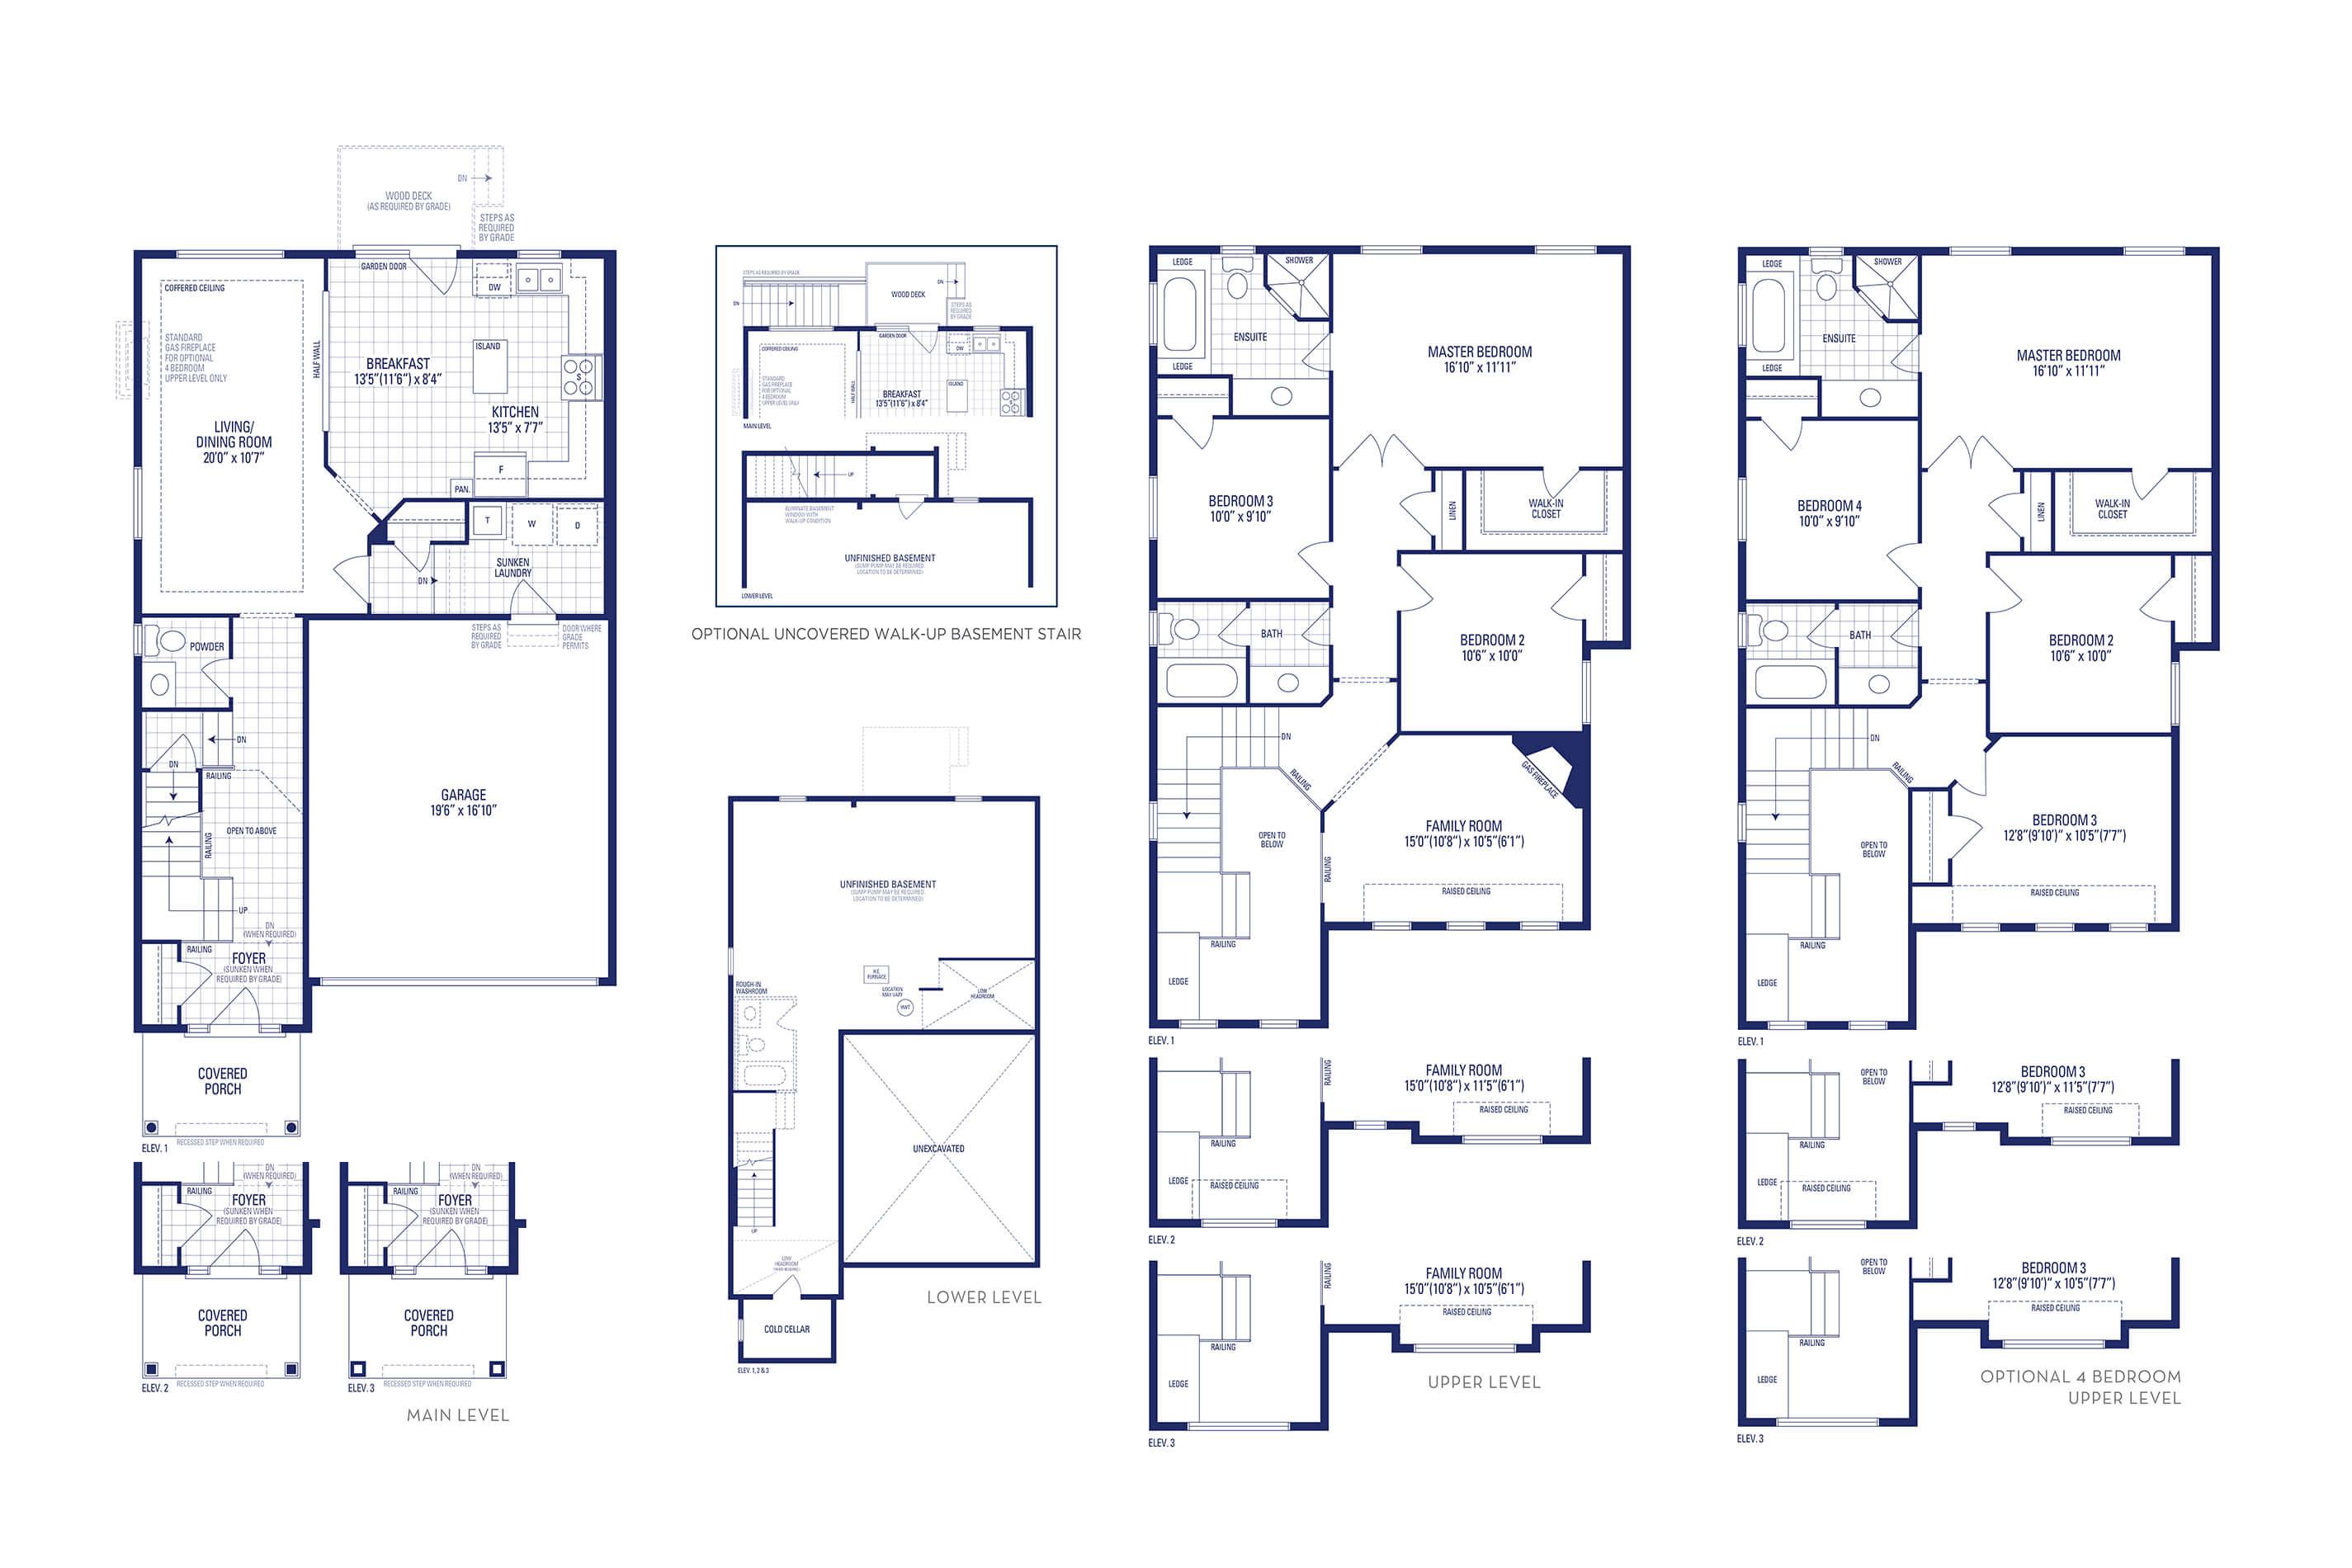 Jersey 02 Elev. 3 Floorplan